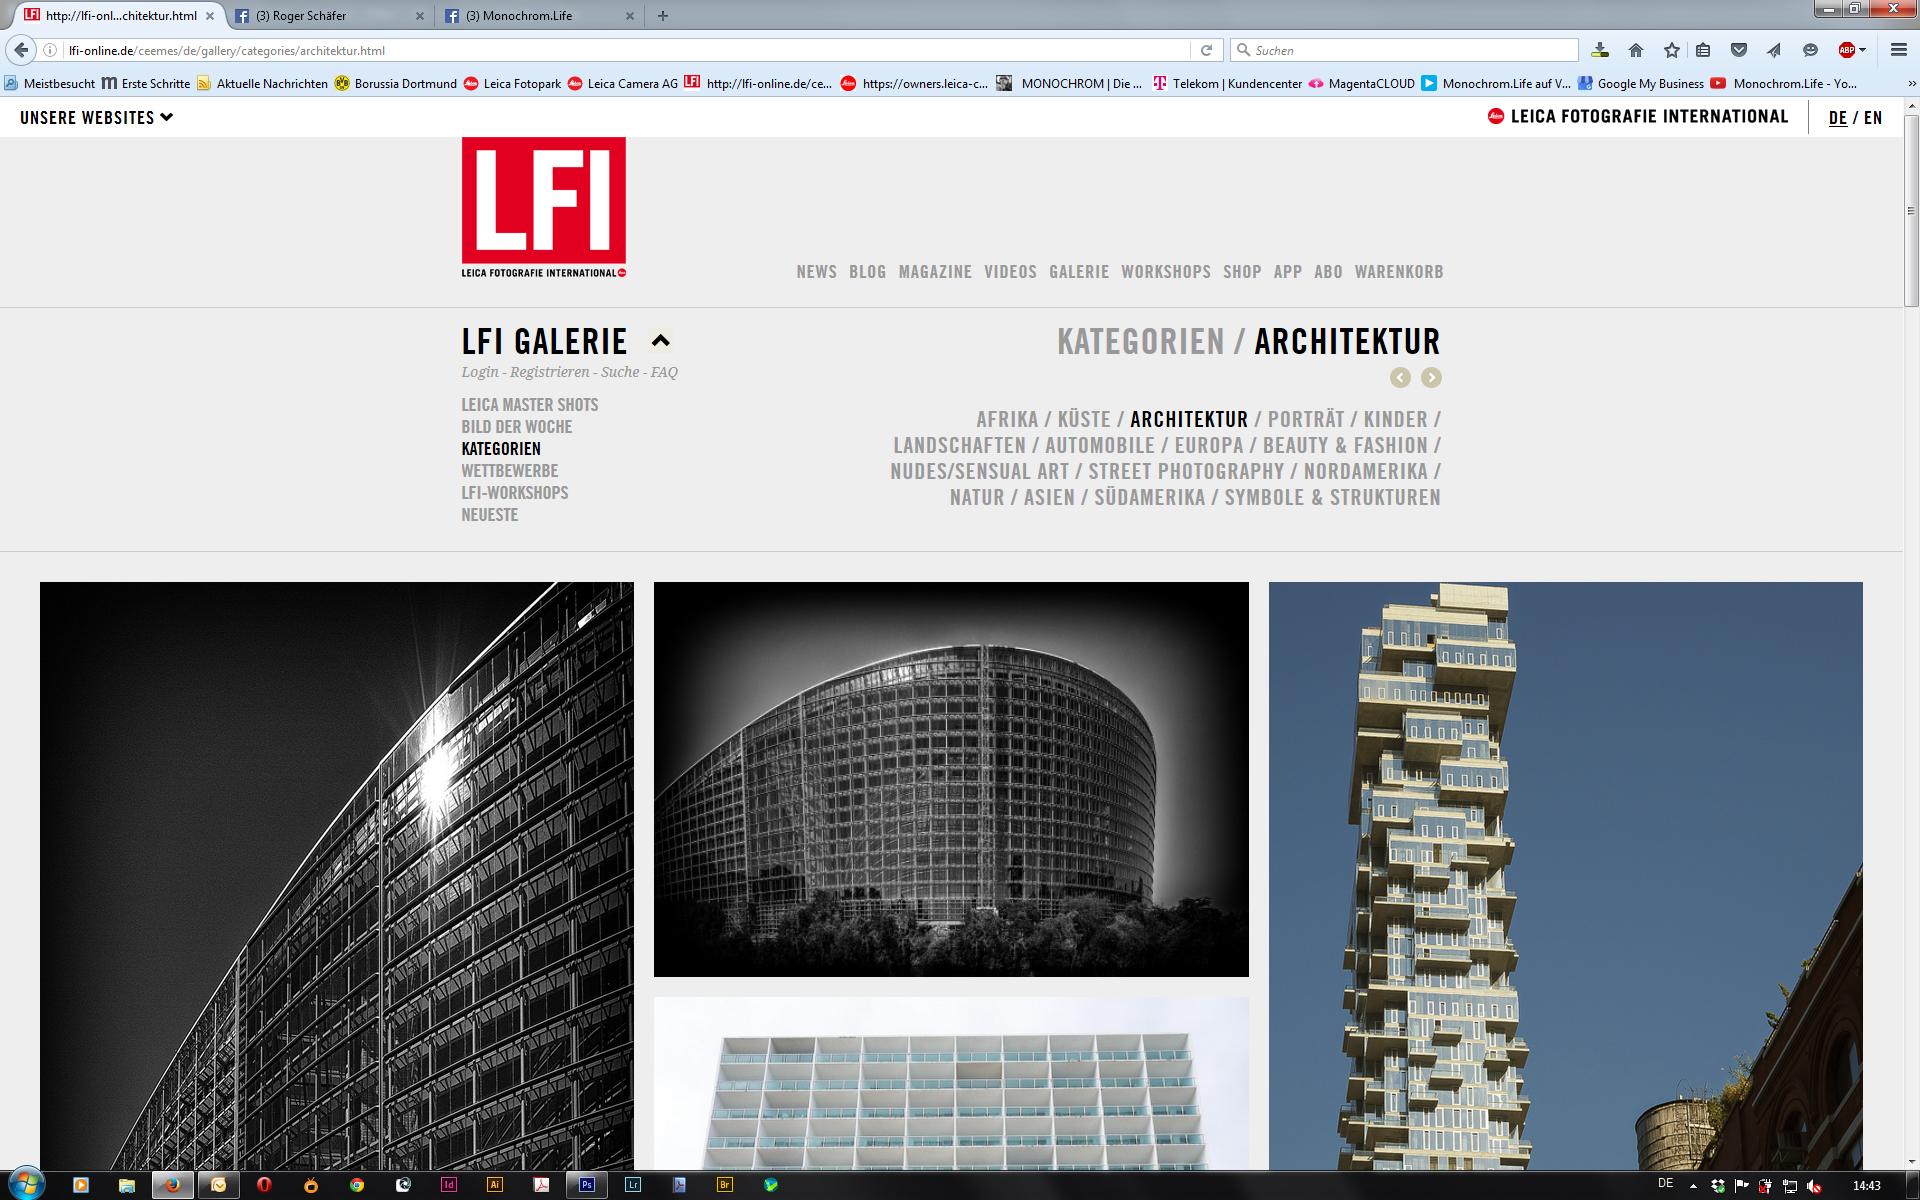 LFI_Architektur4_08_2016 by .